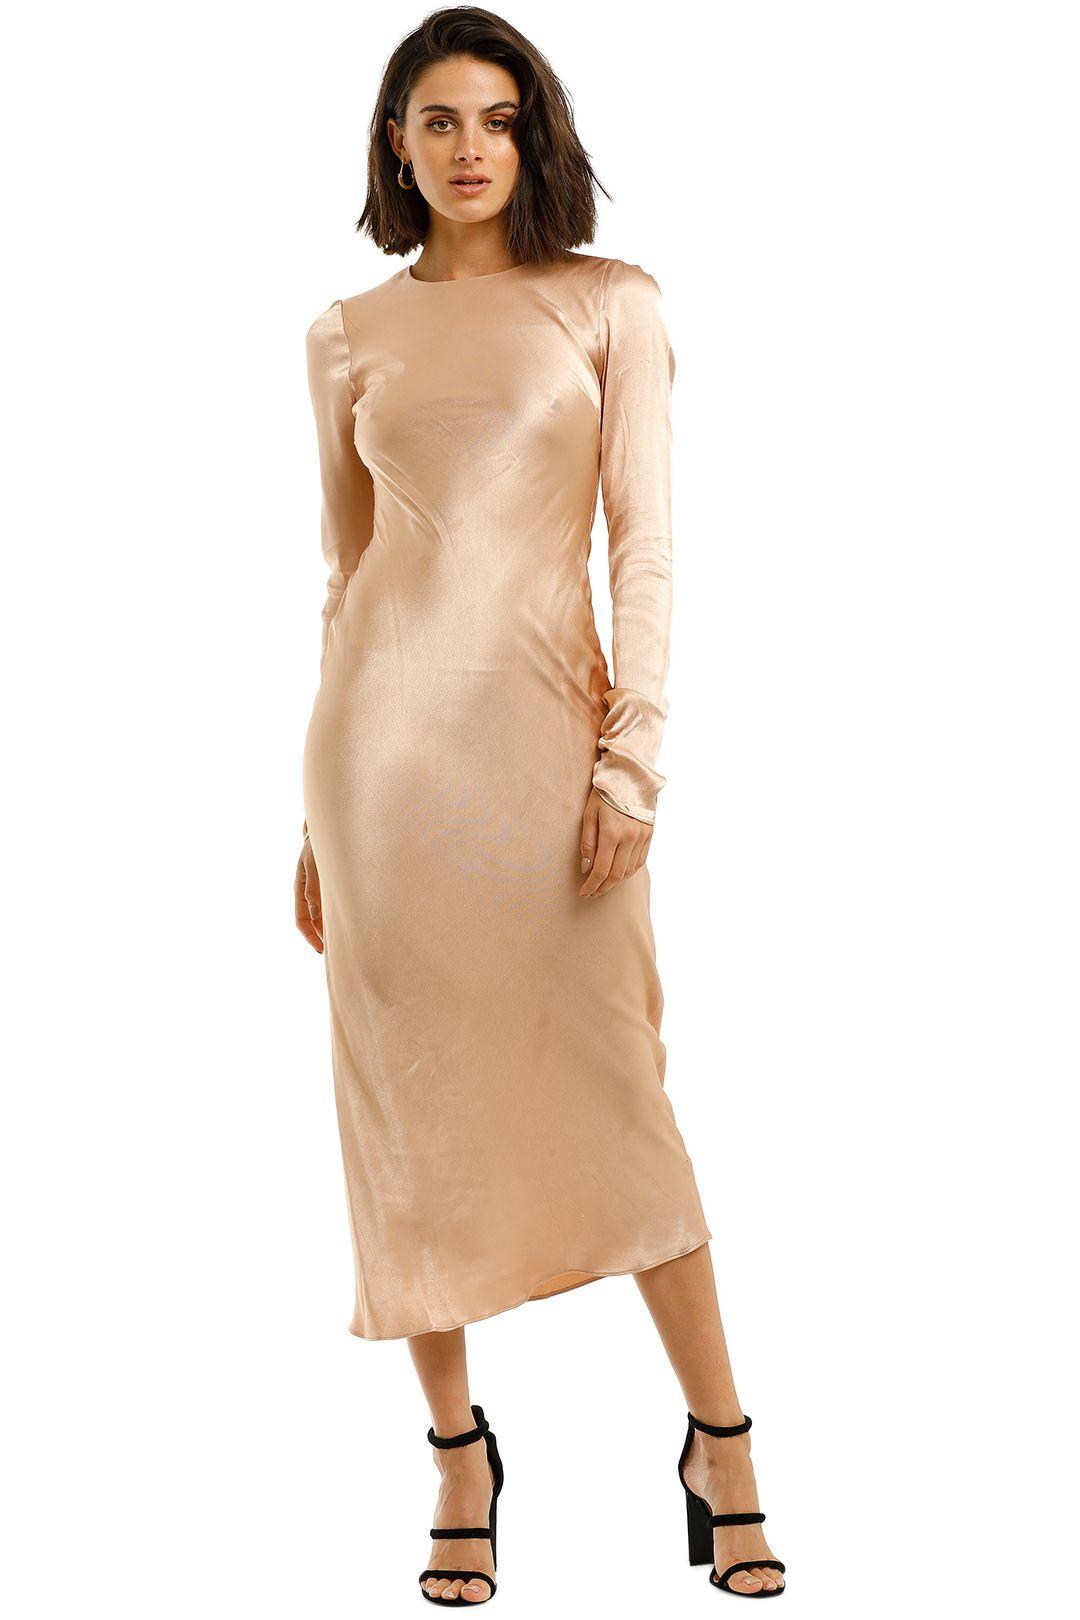 Shona-Joy-Wright-Long-Sleeve-Bias-Midi-Desert-Rose-Front